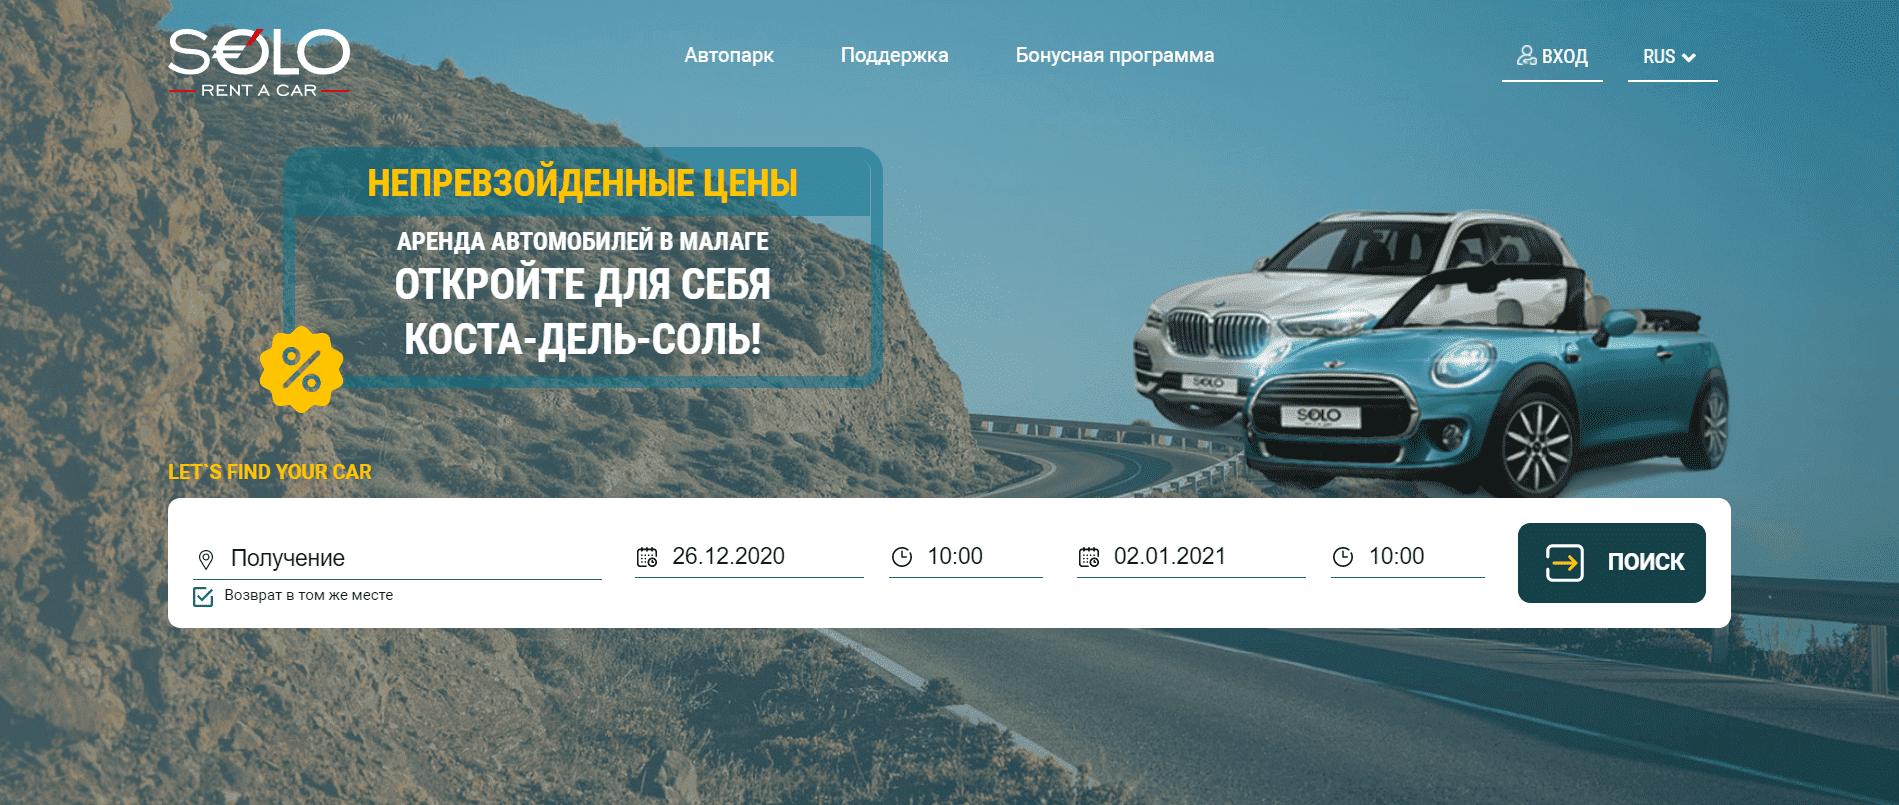 Рост посещаемости сайта в 2,5 раза за 4 месяца. Аренда автомобилей в Испании.